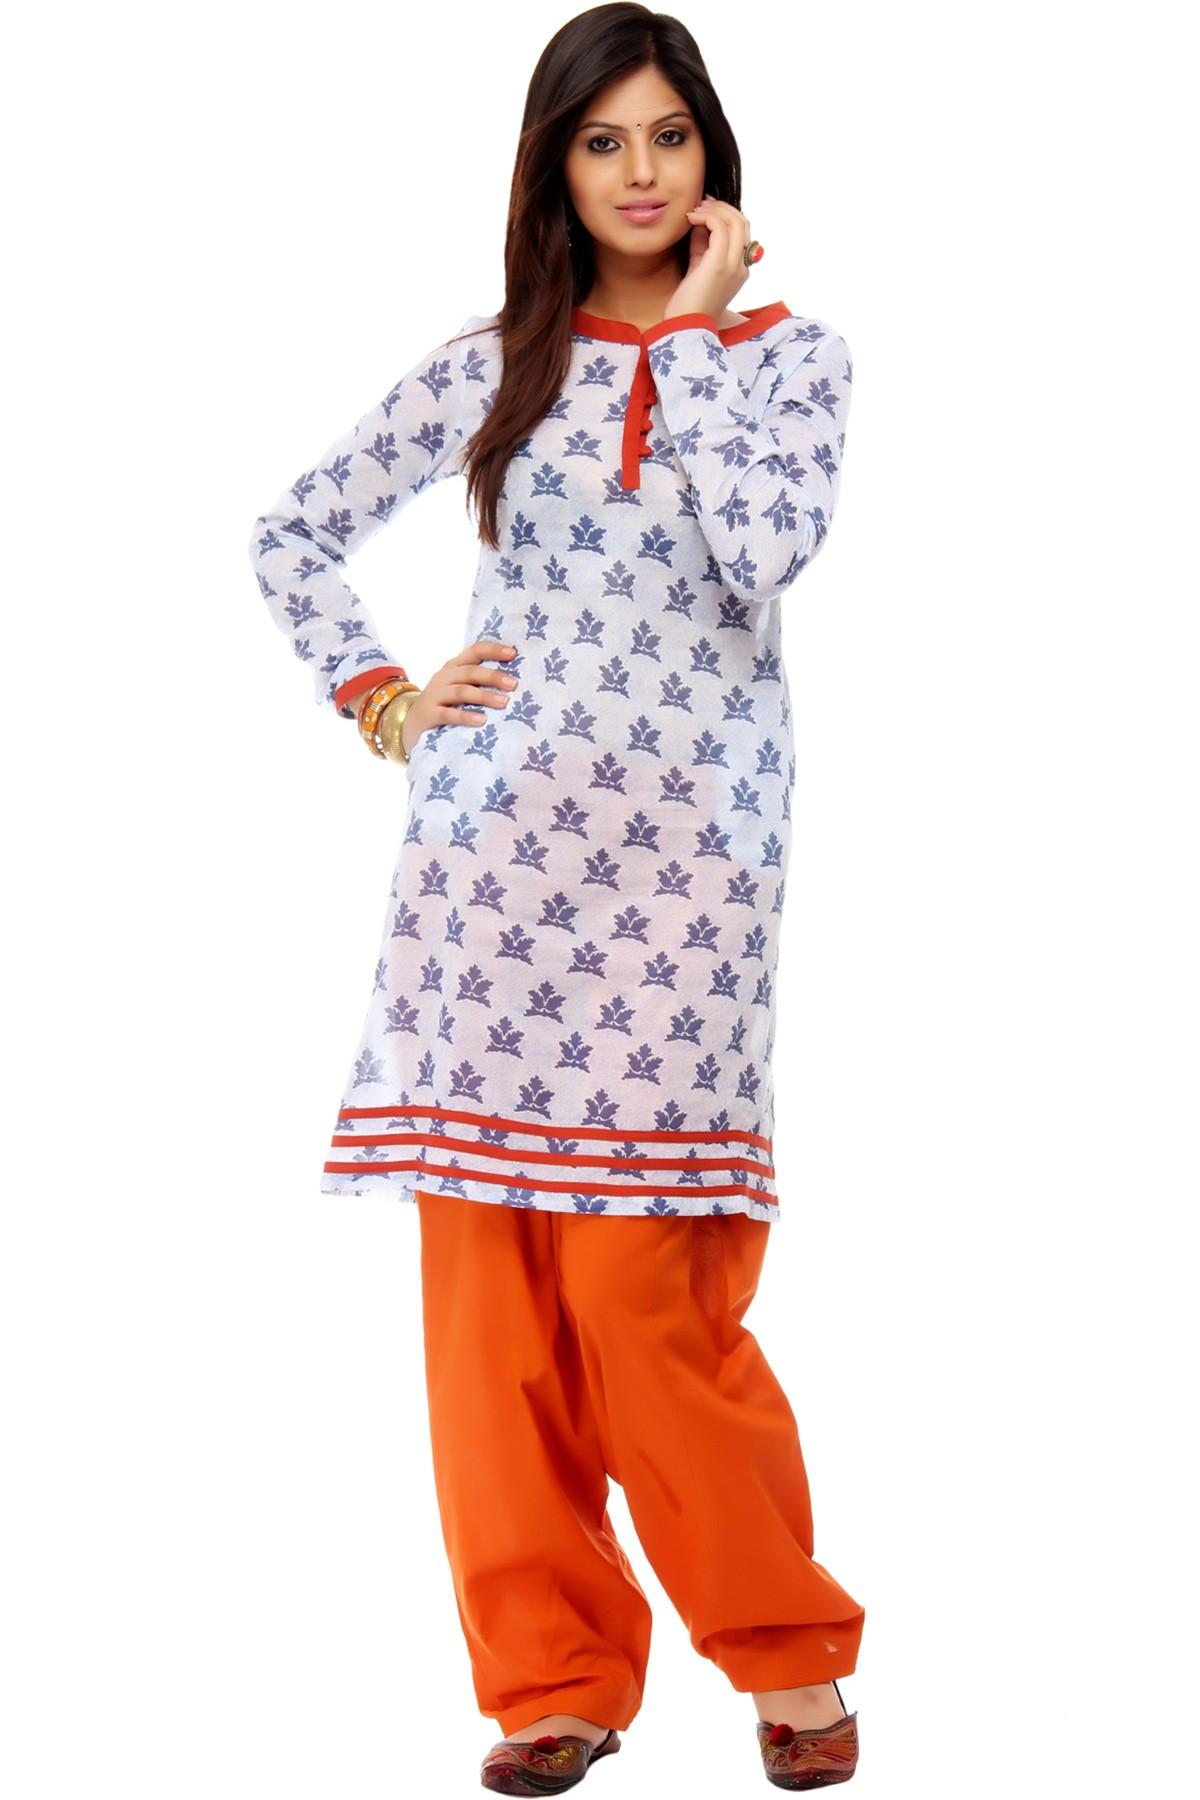 The Basic Salwar